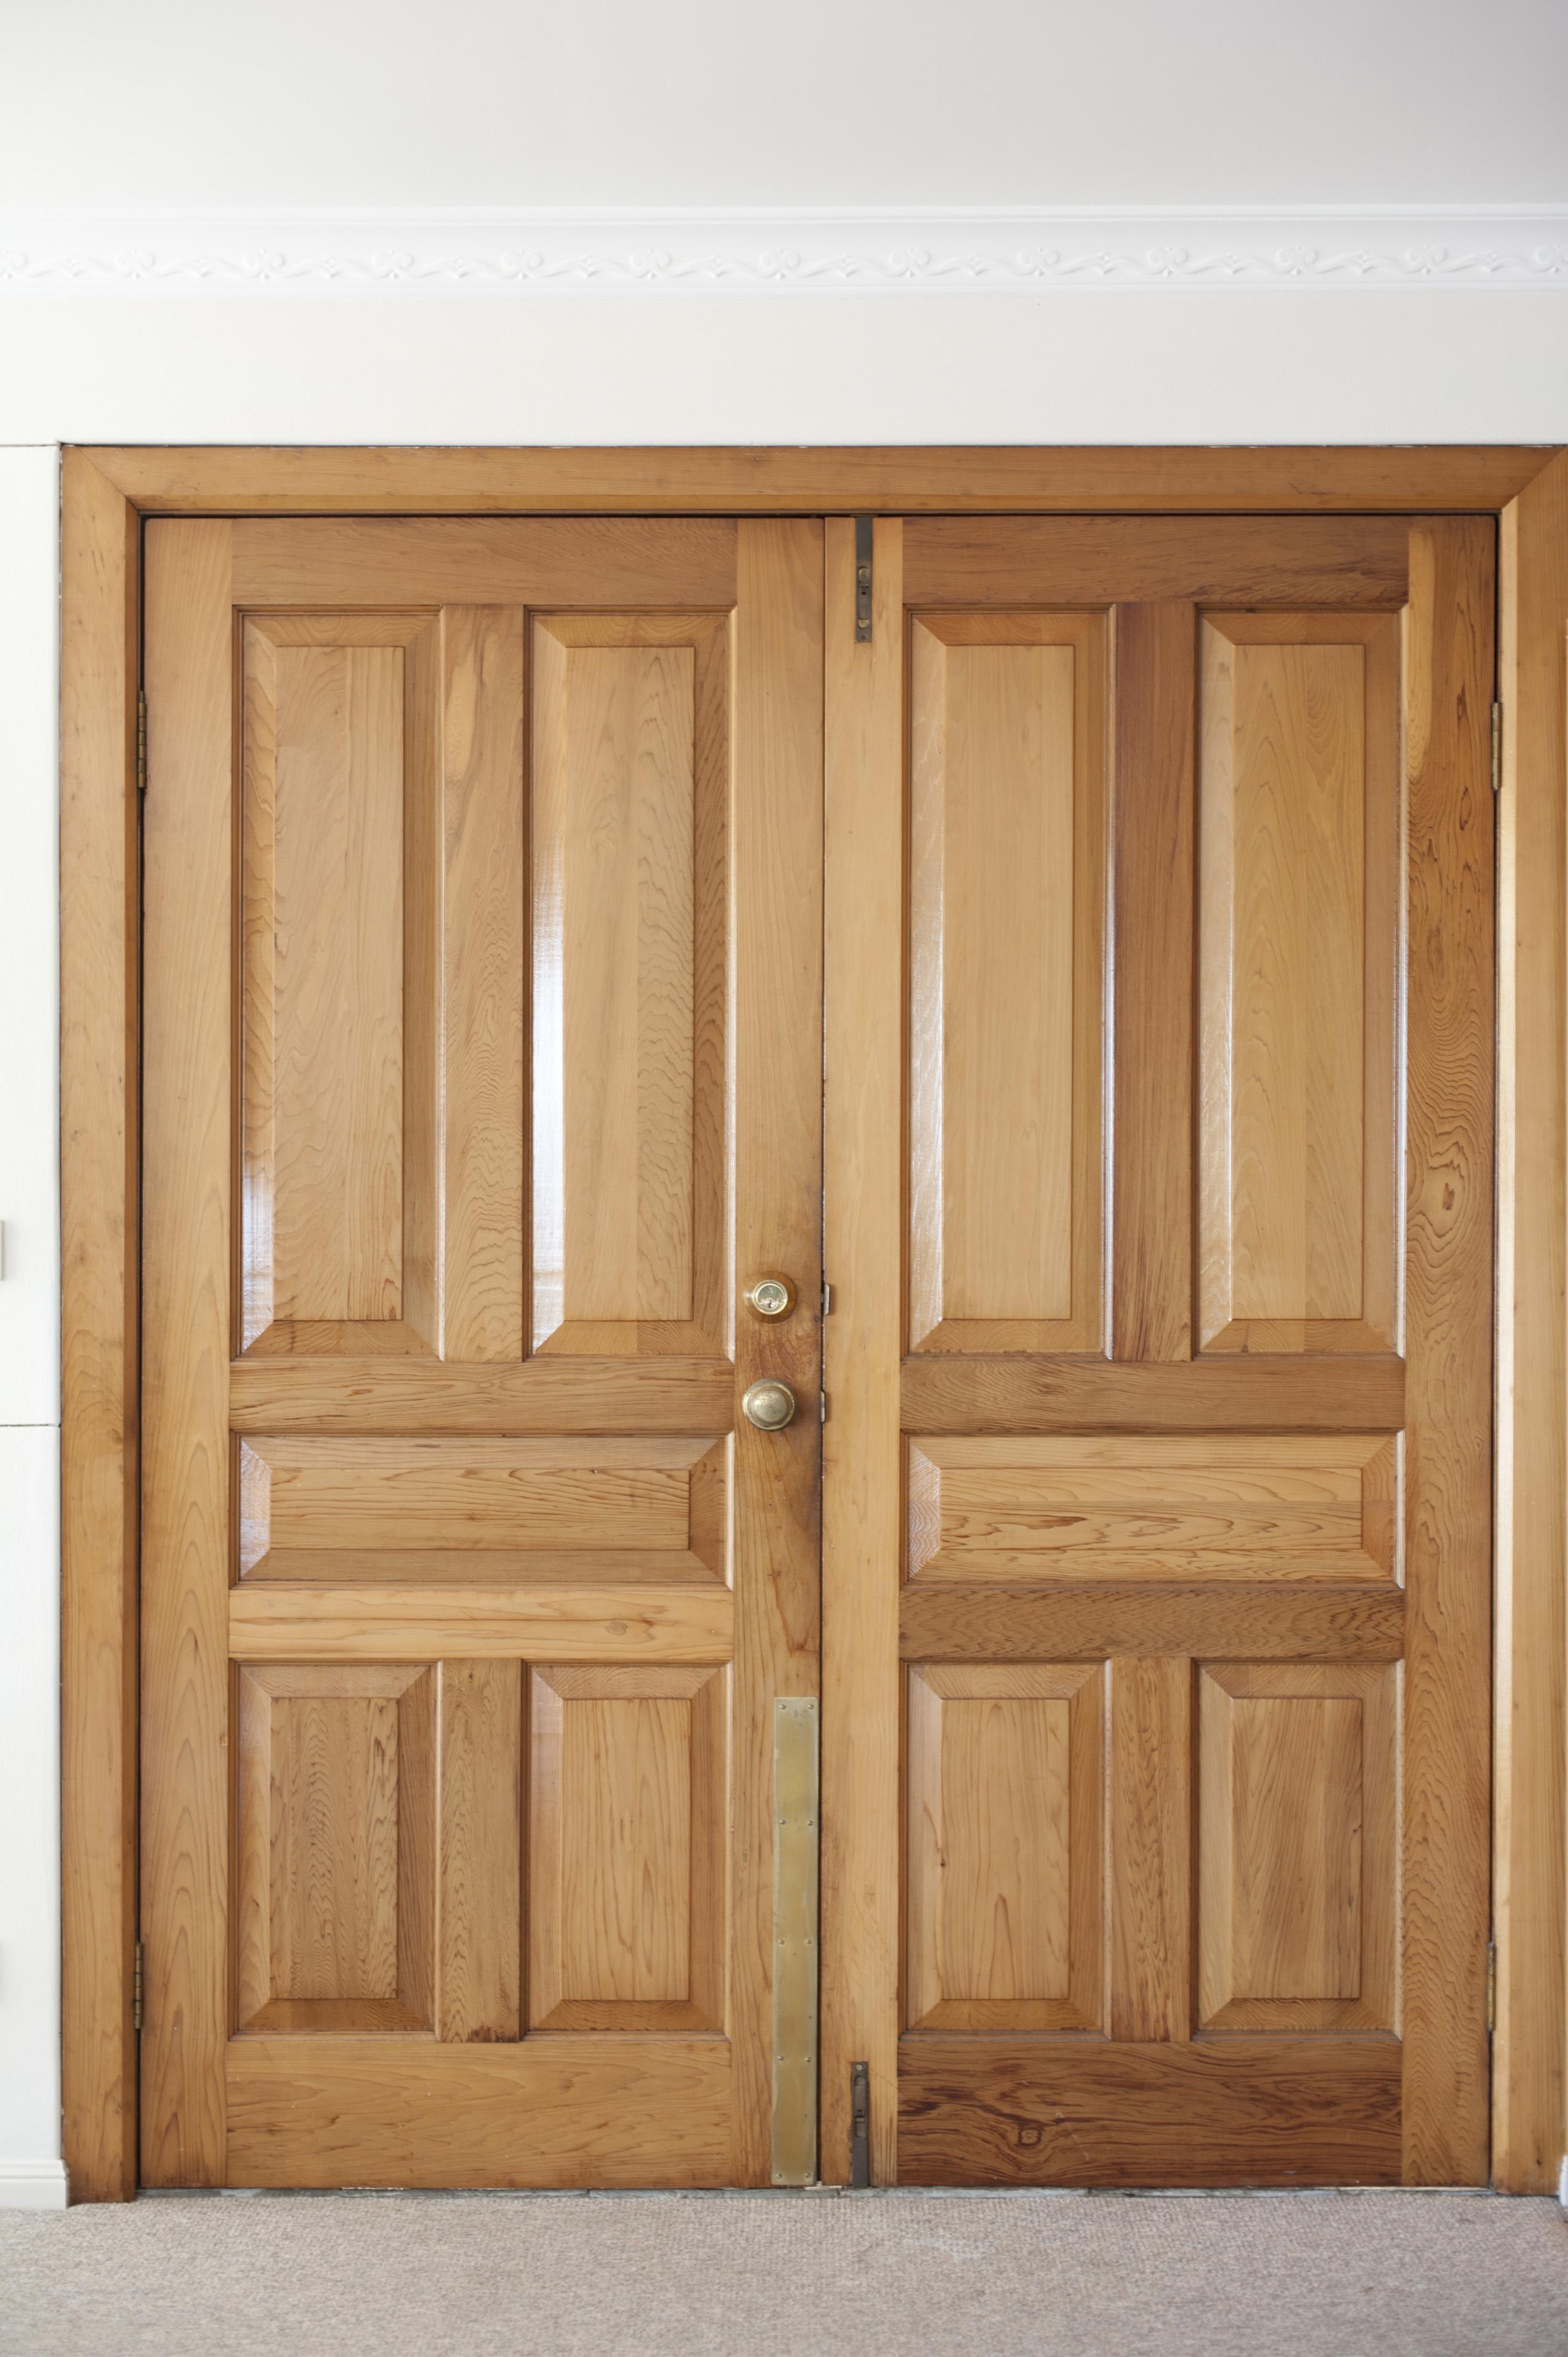 Image of Modern double wooden front door | Freebie.Photography